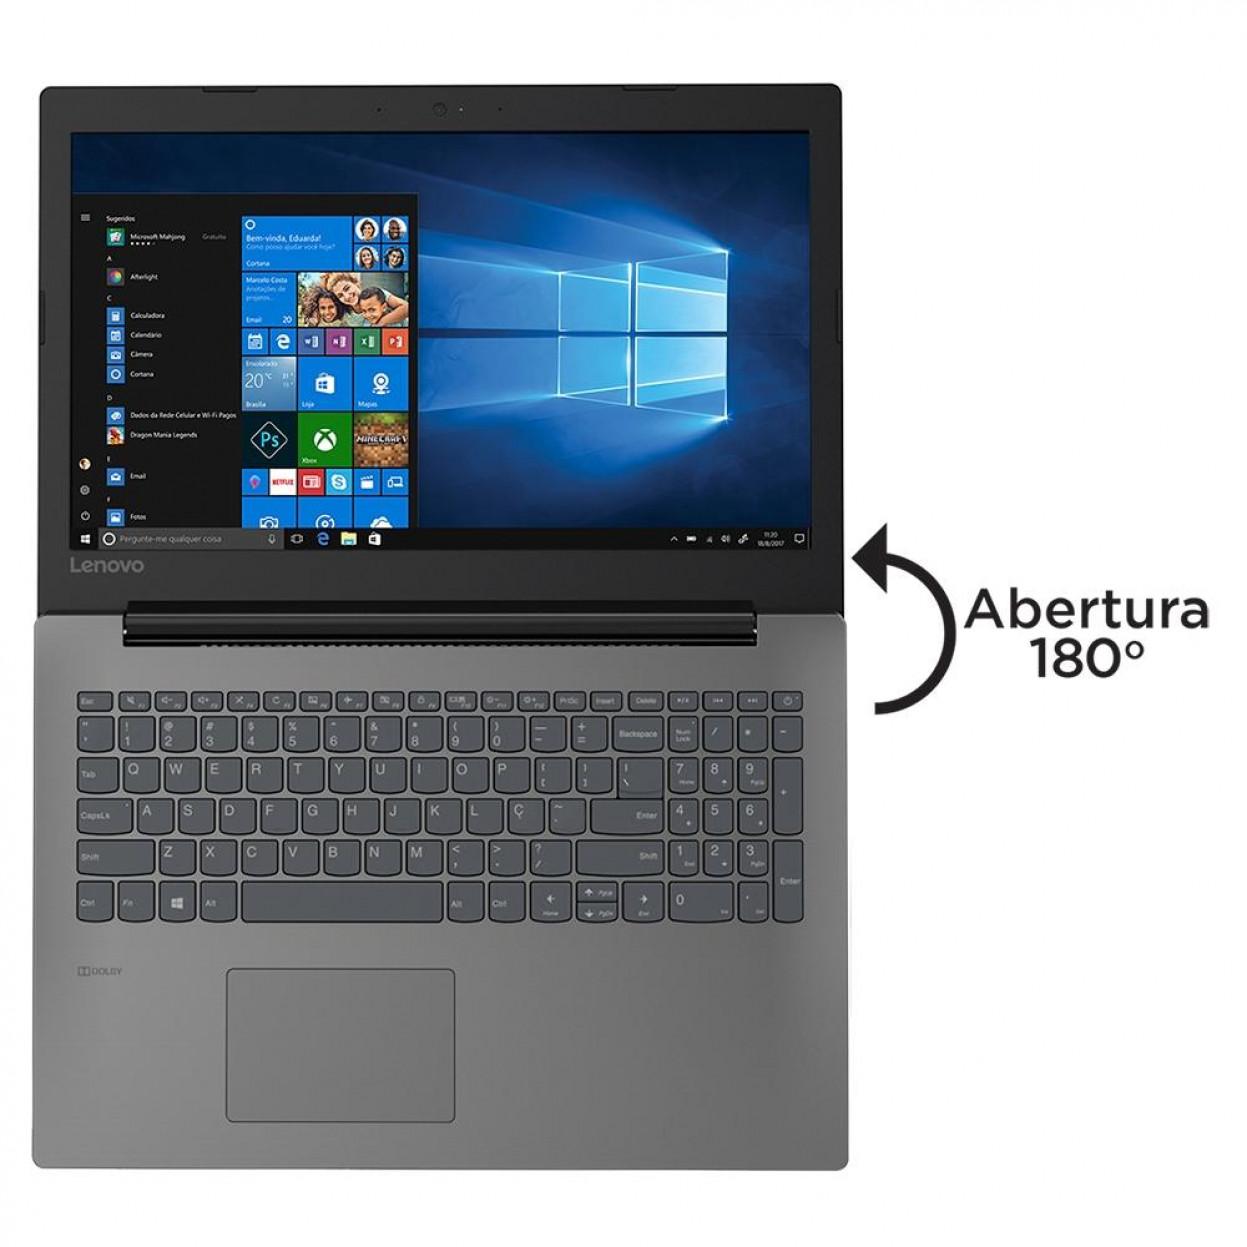 Notebook Lenovo B330 Core I5 8250u Memoria 8gb Ddr4 Ssd 120gb Tela 15.6' Fhd Windows 10 Home